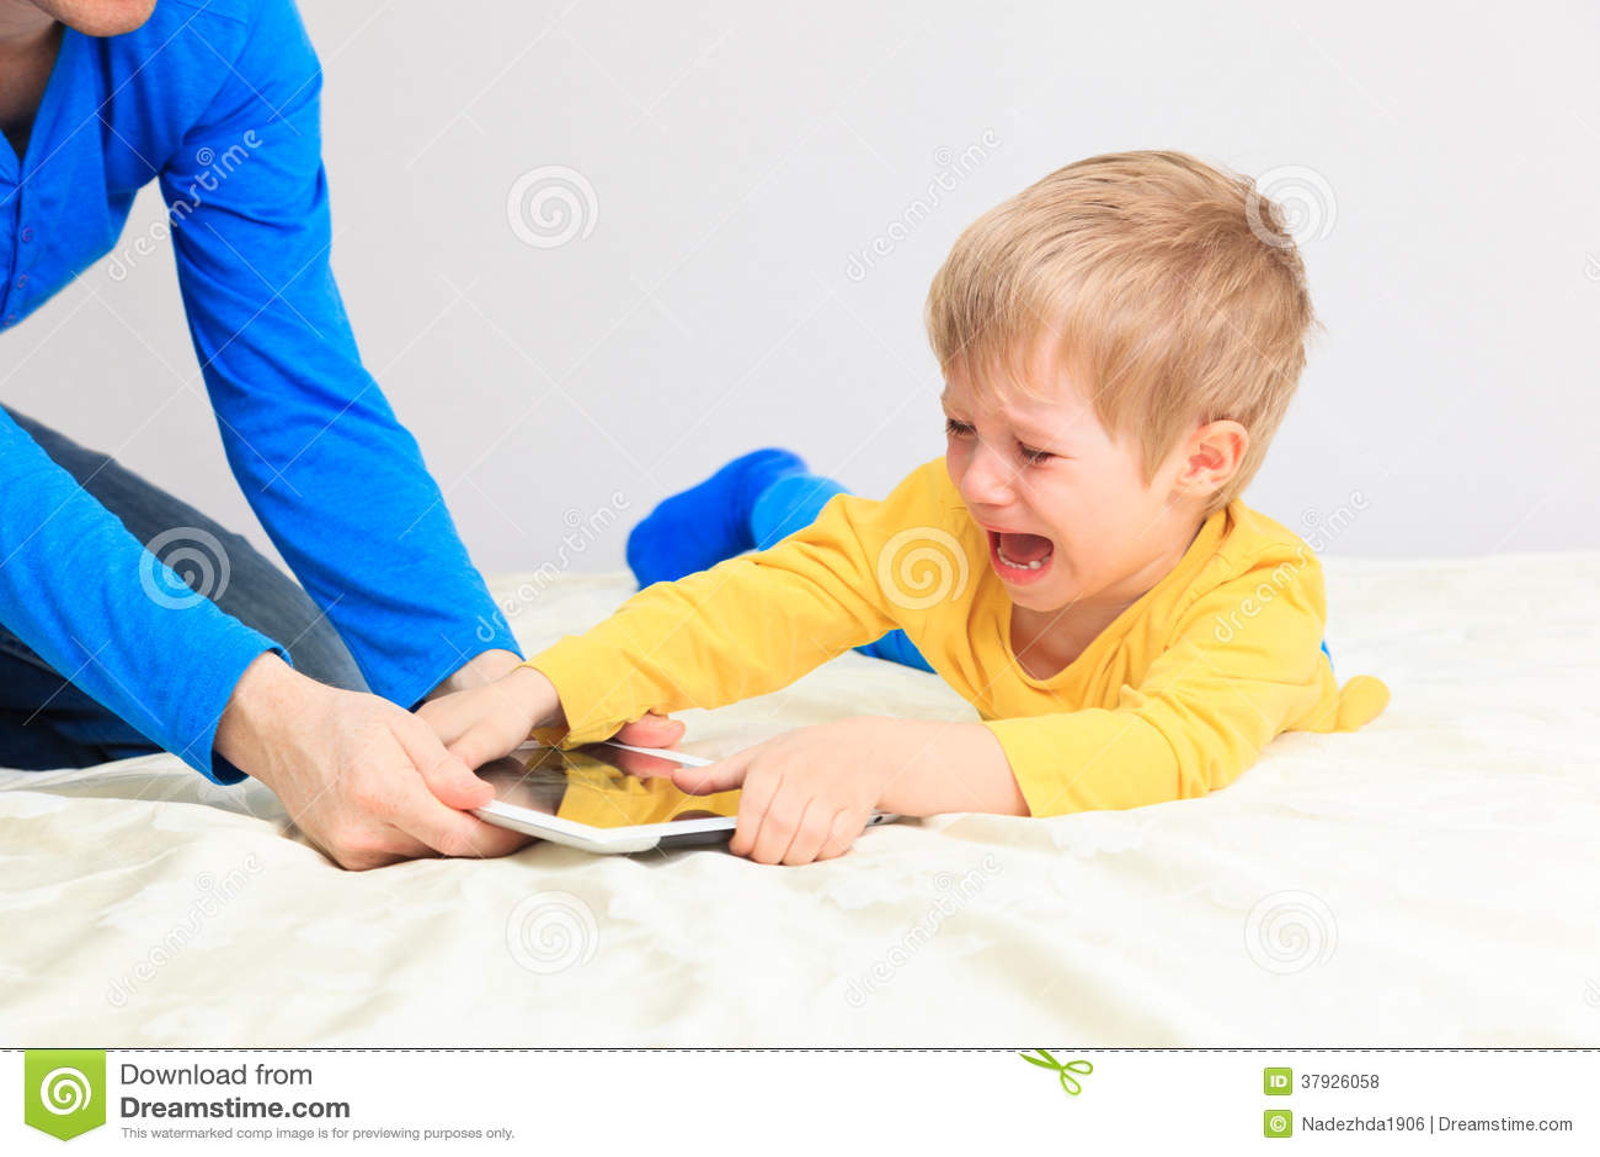 Download Computer addiction stock photo. Image of emotion, gambling - 37926058